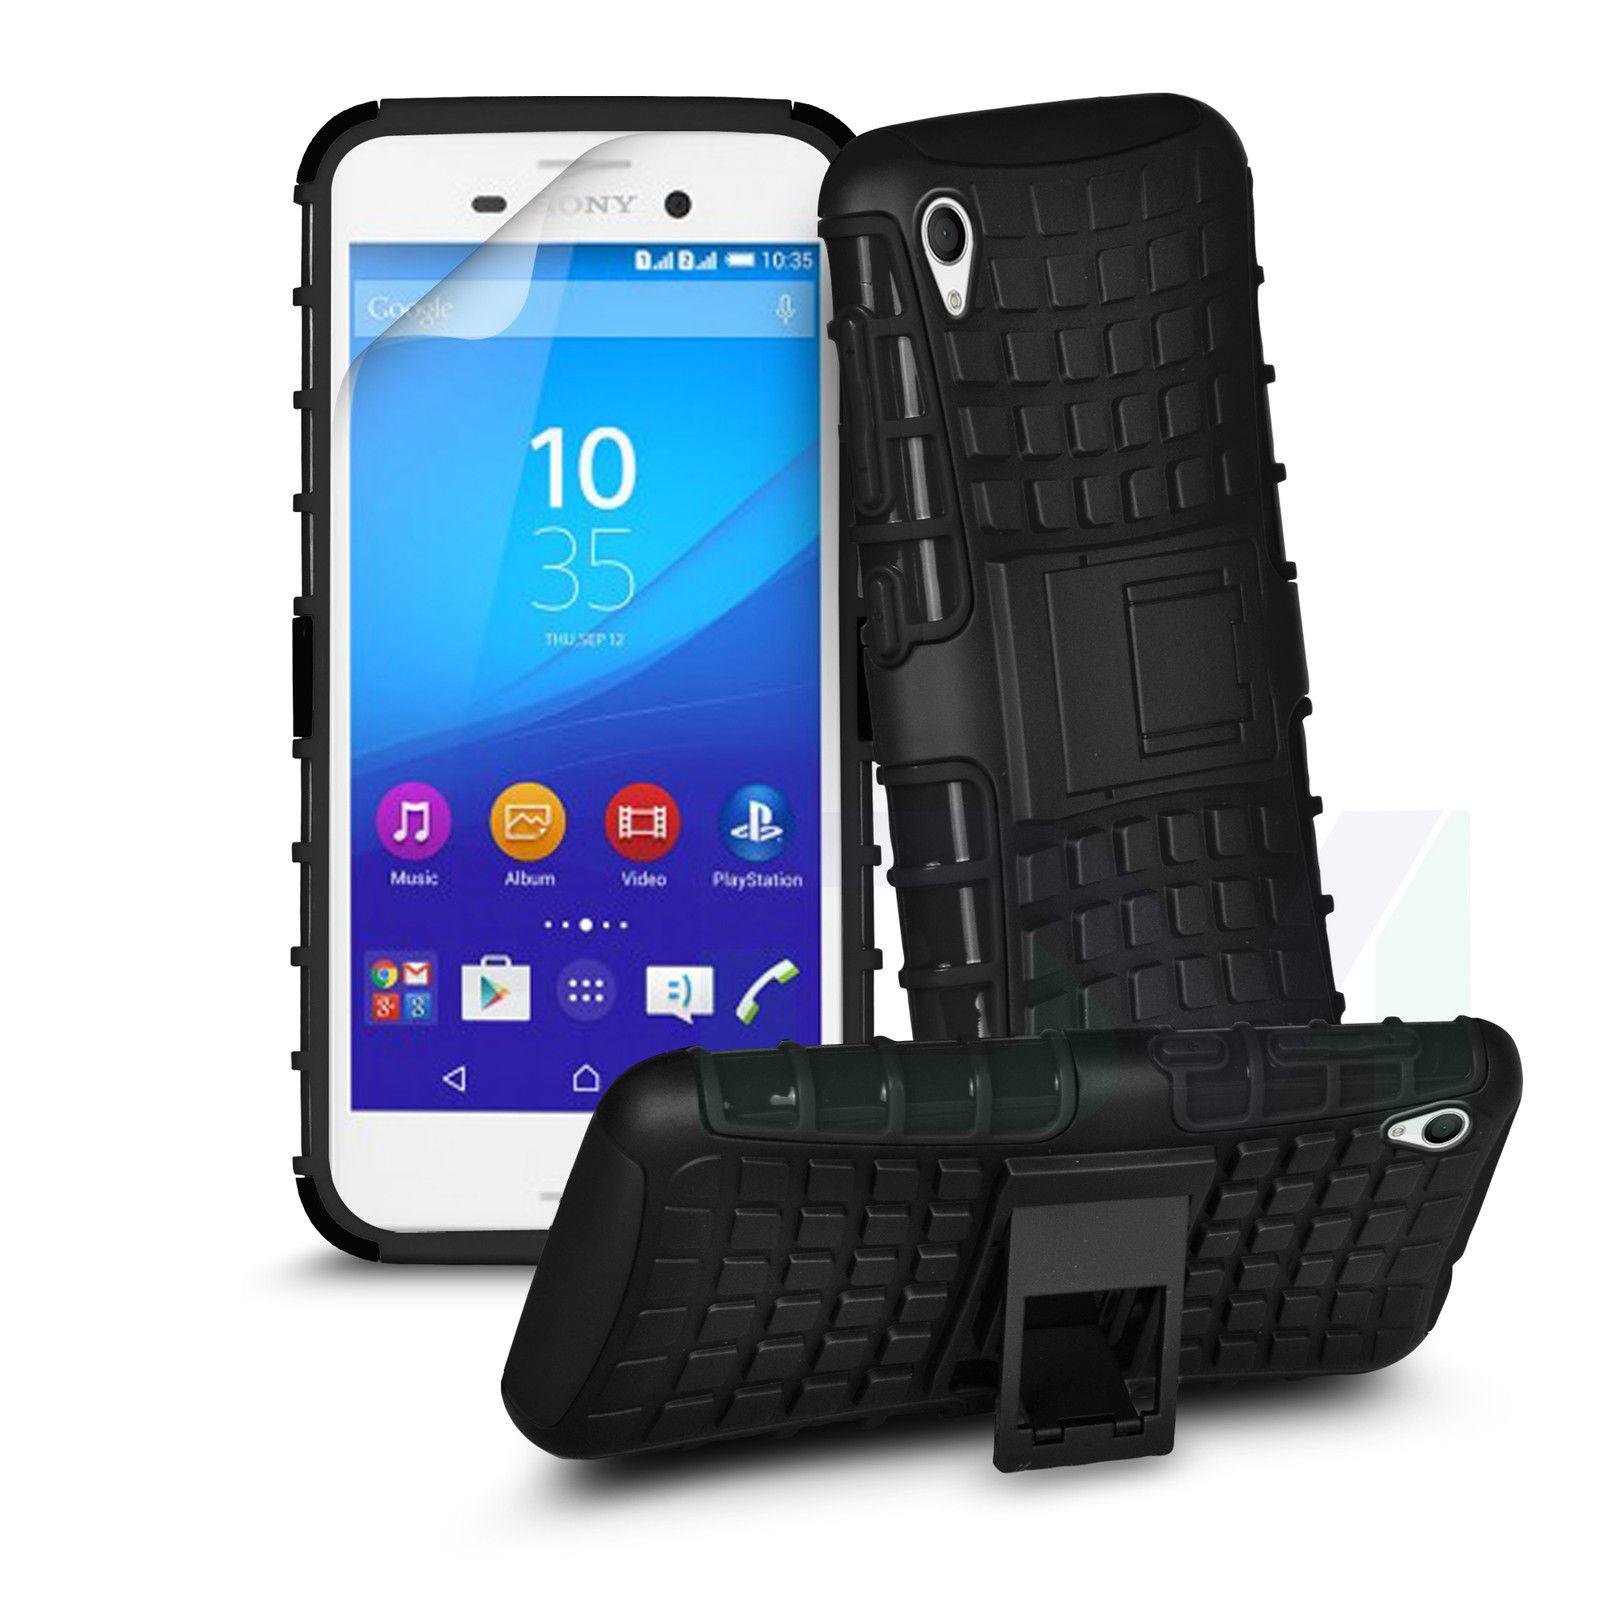 Odolné pouzdro PANZER CASE na mobilní telefon Sony Xperia Z3 Černé (Odolný kryt či obal na mobil Sony Xperia Z3 se stojánkem)